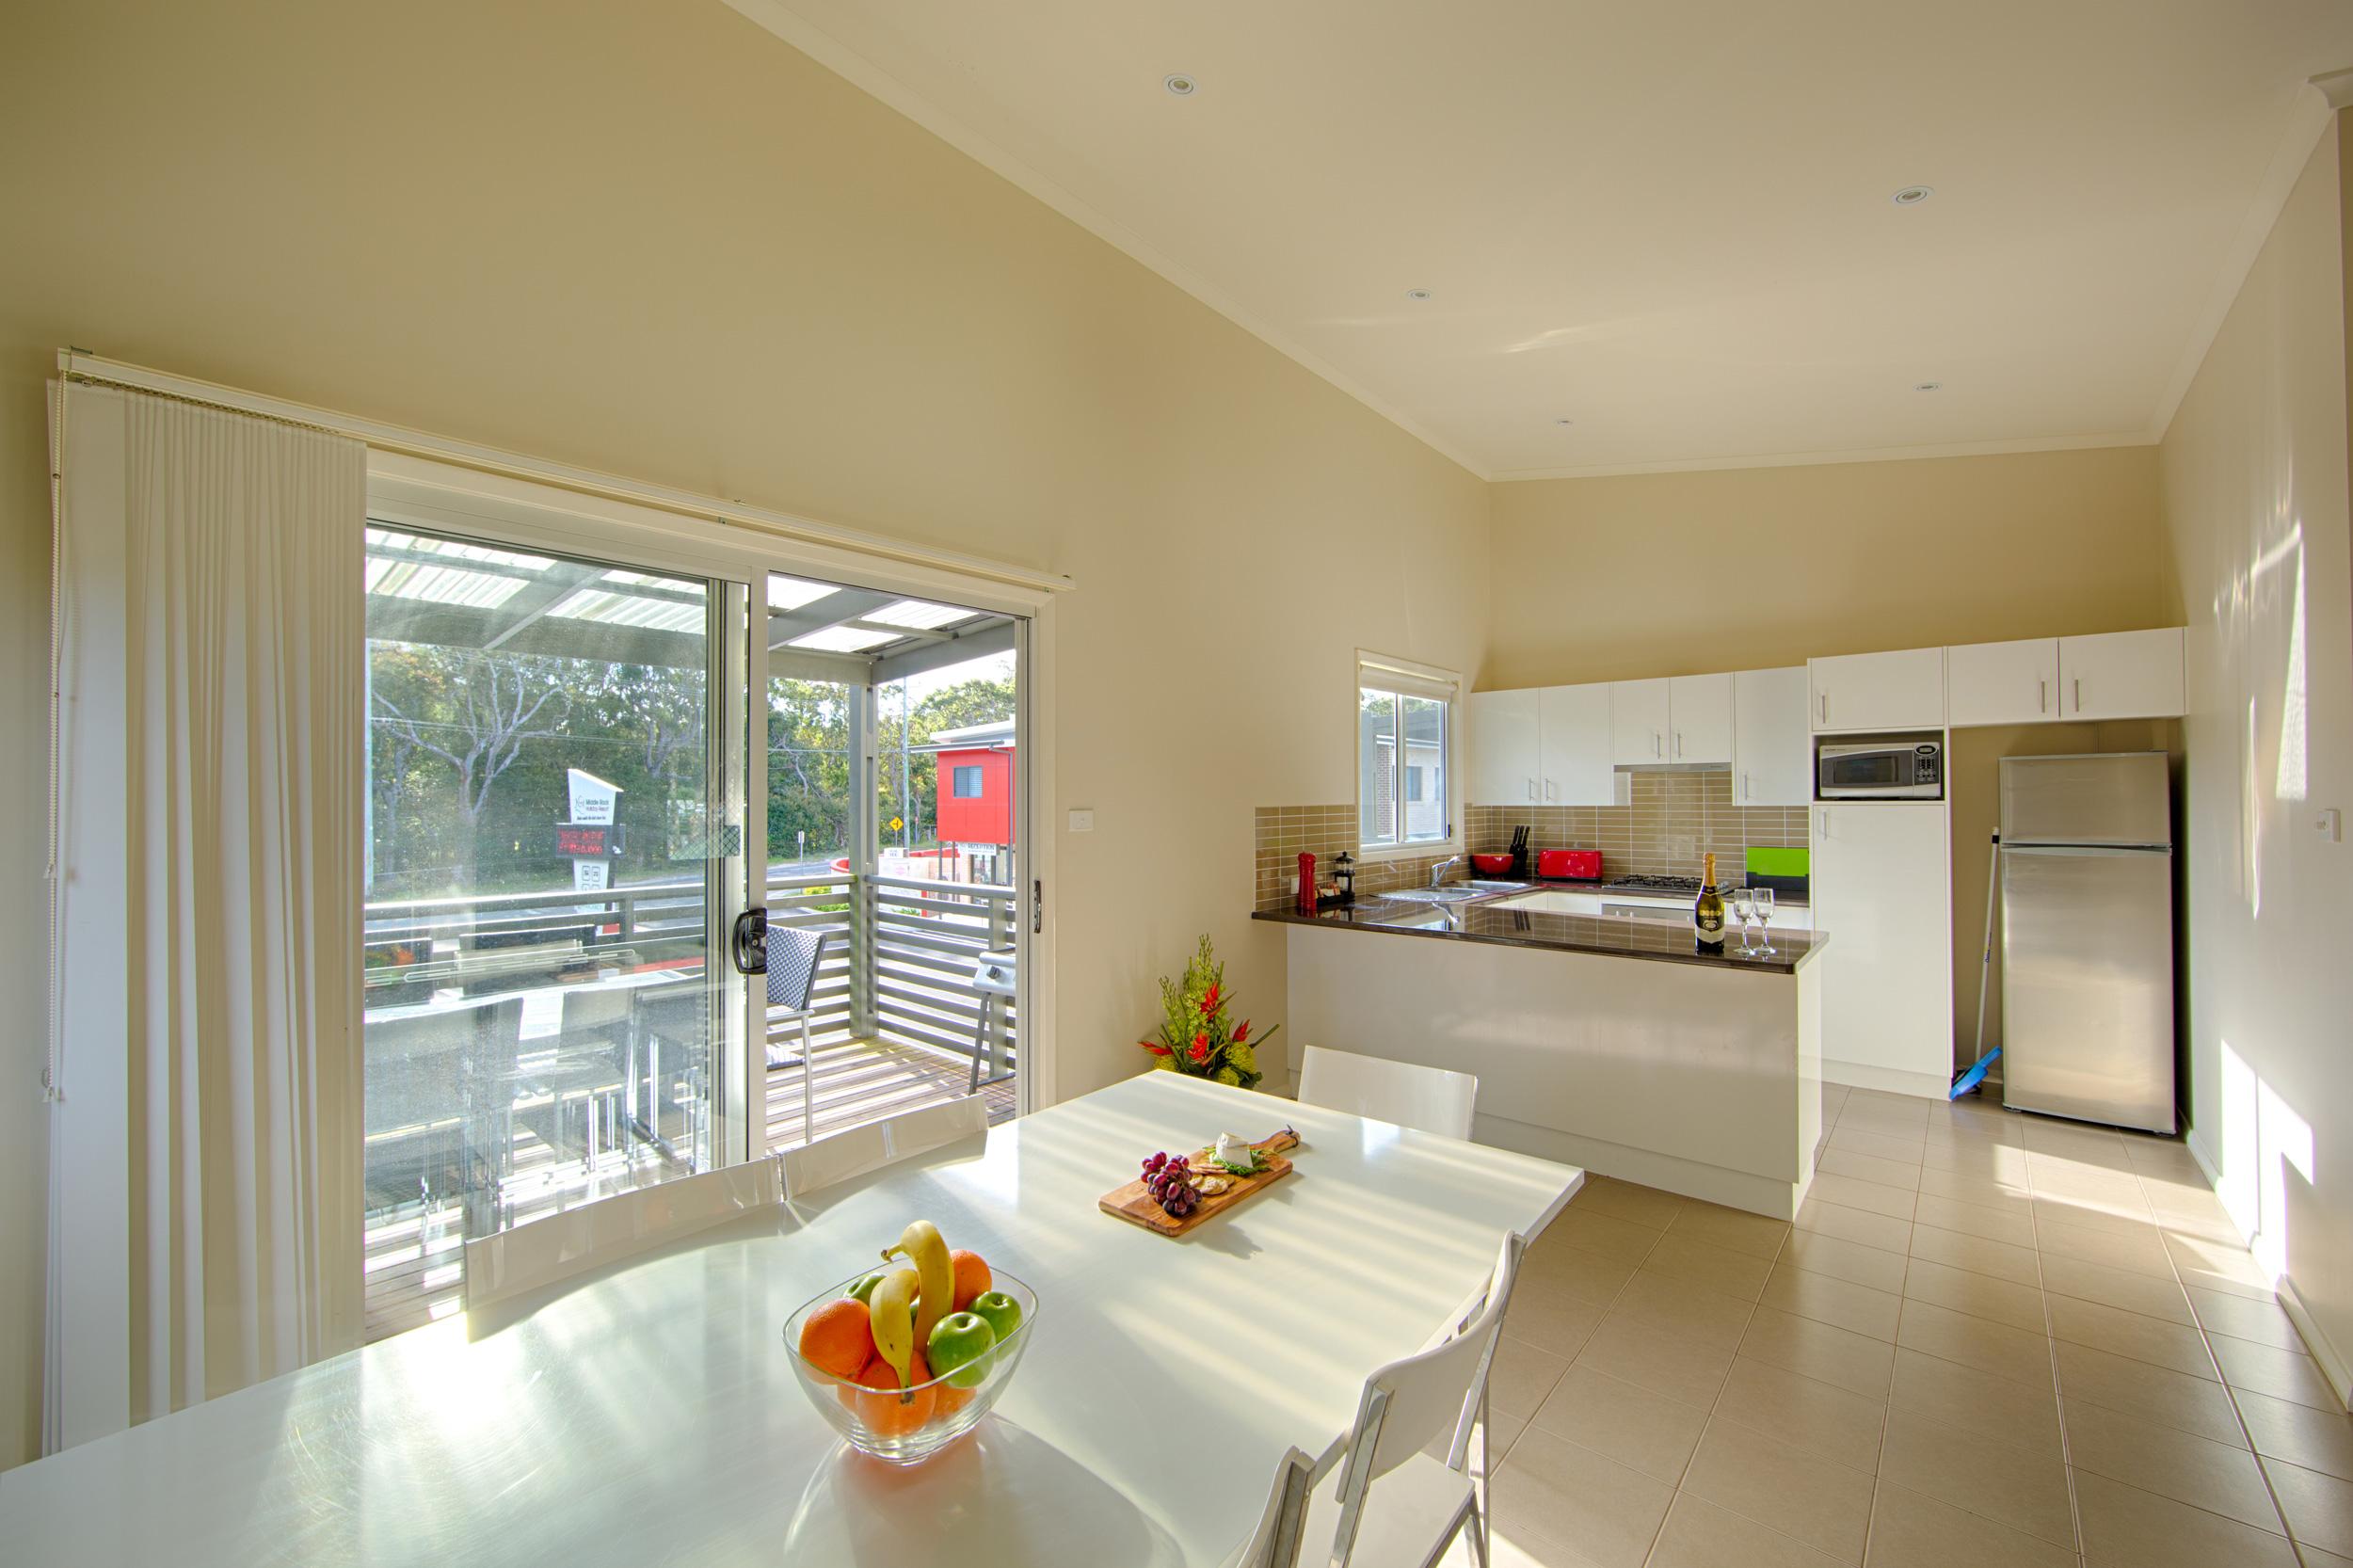 Apartment-Pic-1-kitchen-dining-verandah.jpg